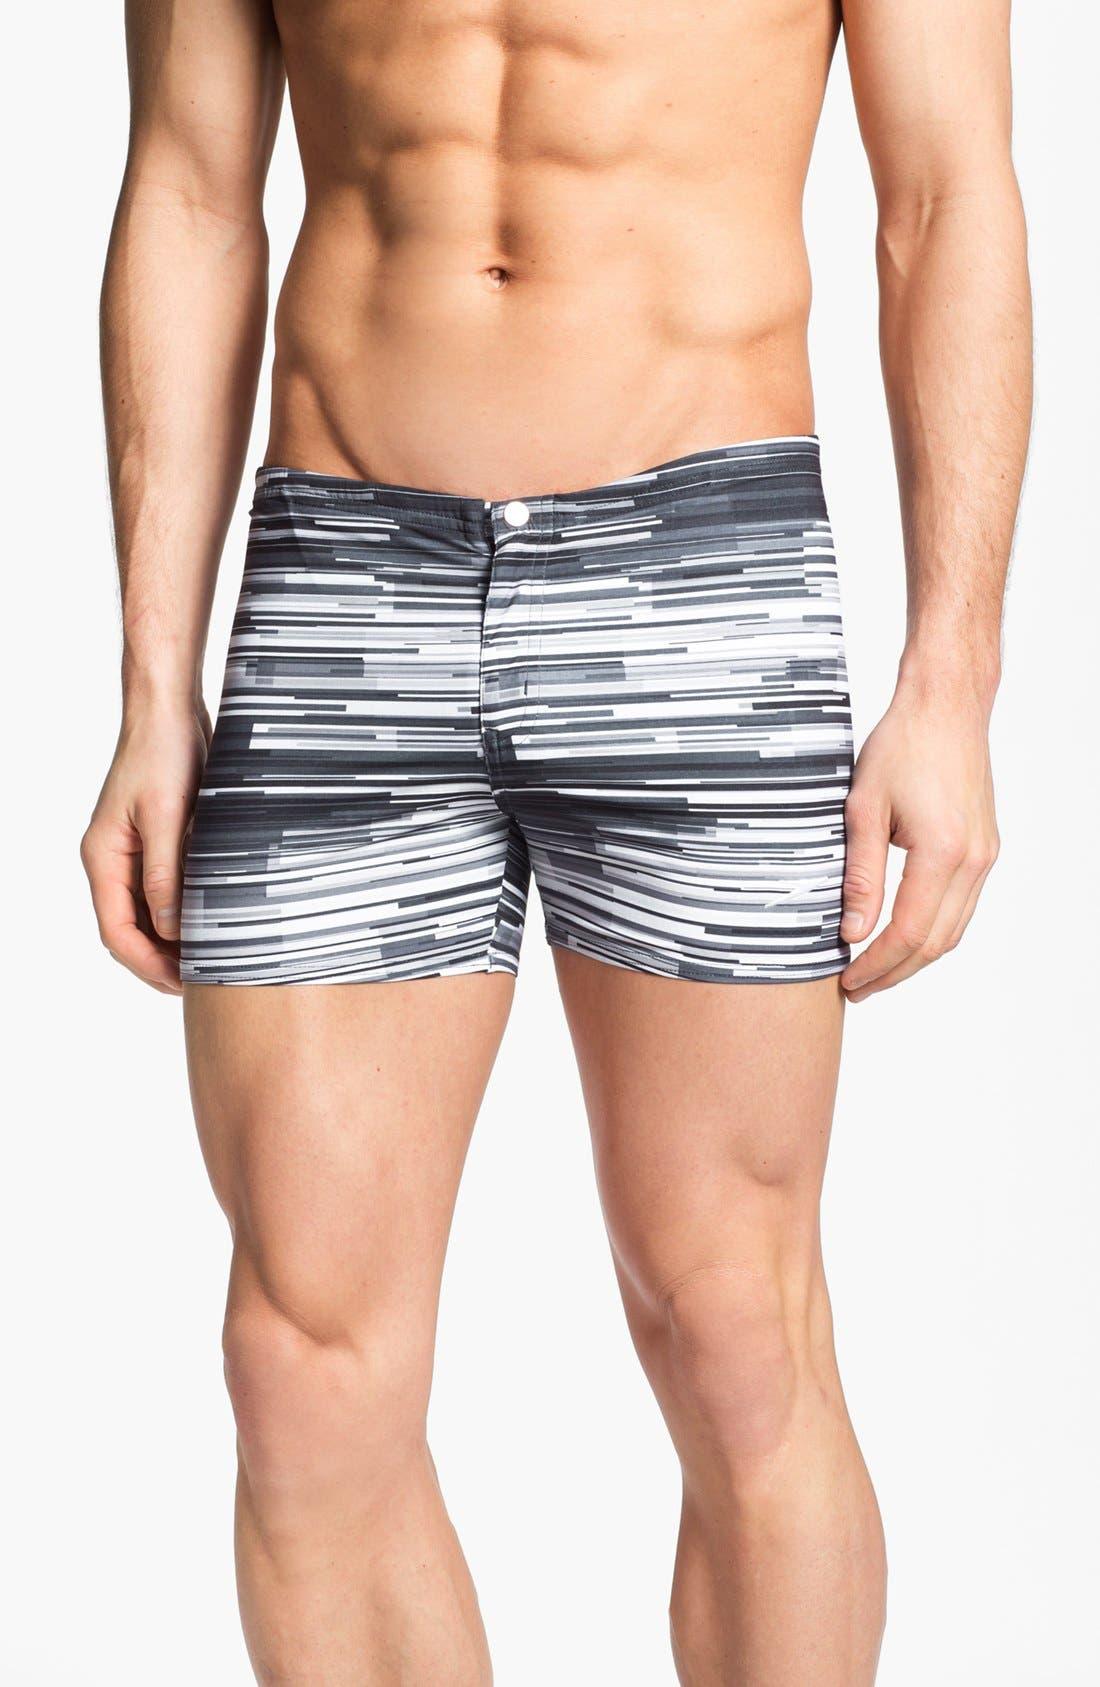 Main Image - Speedo® 'Linear Motion' Square Cut Swim Trunks